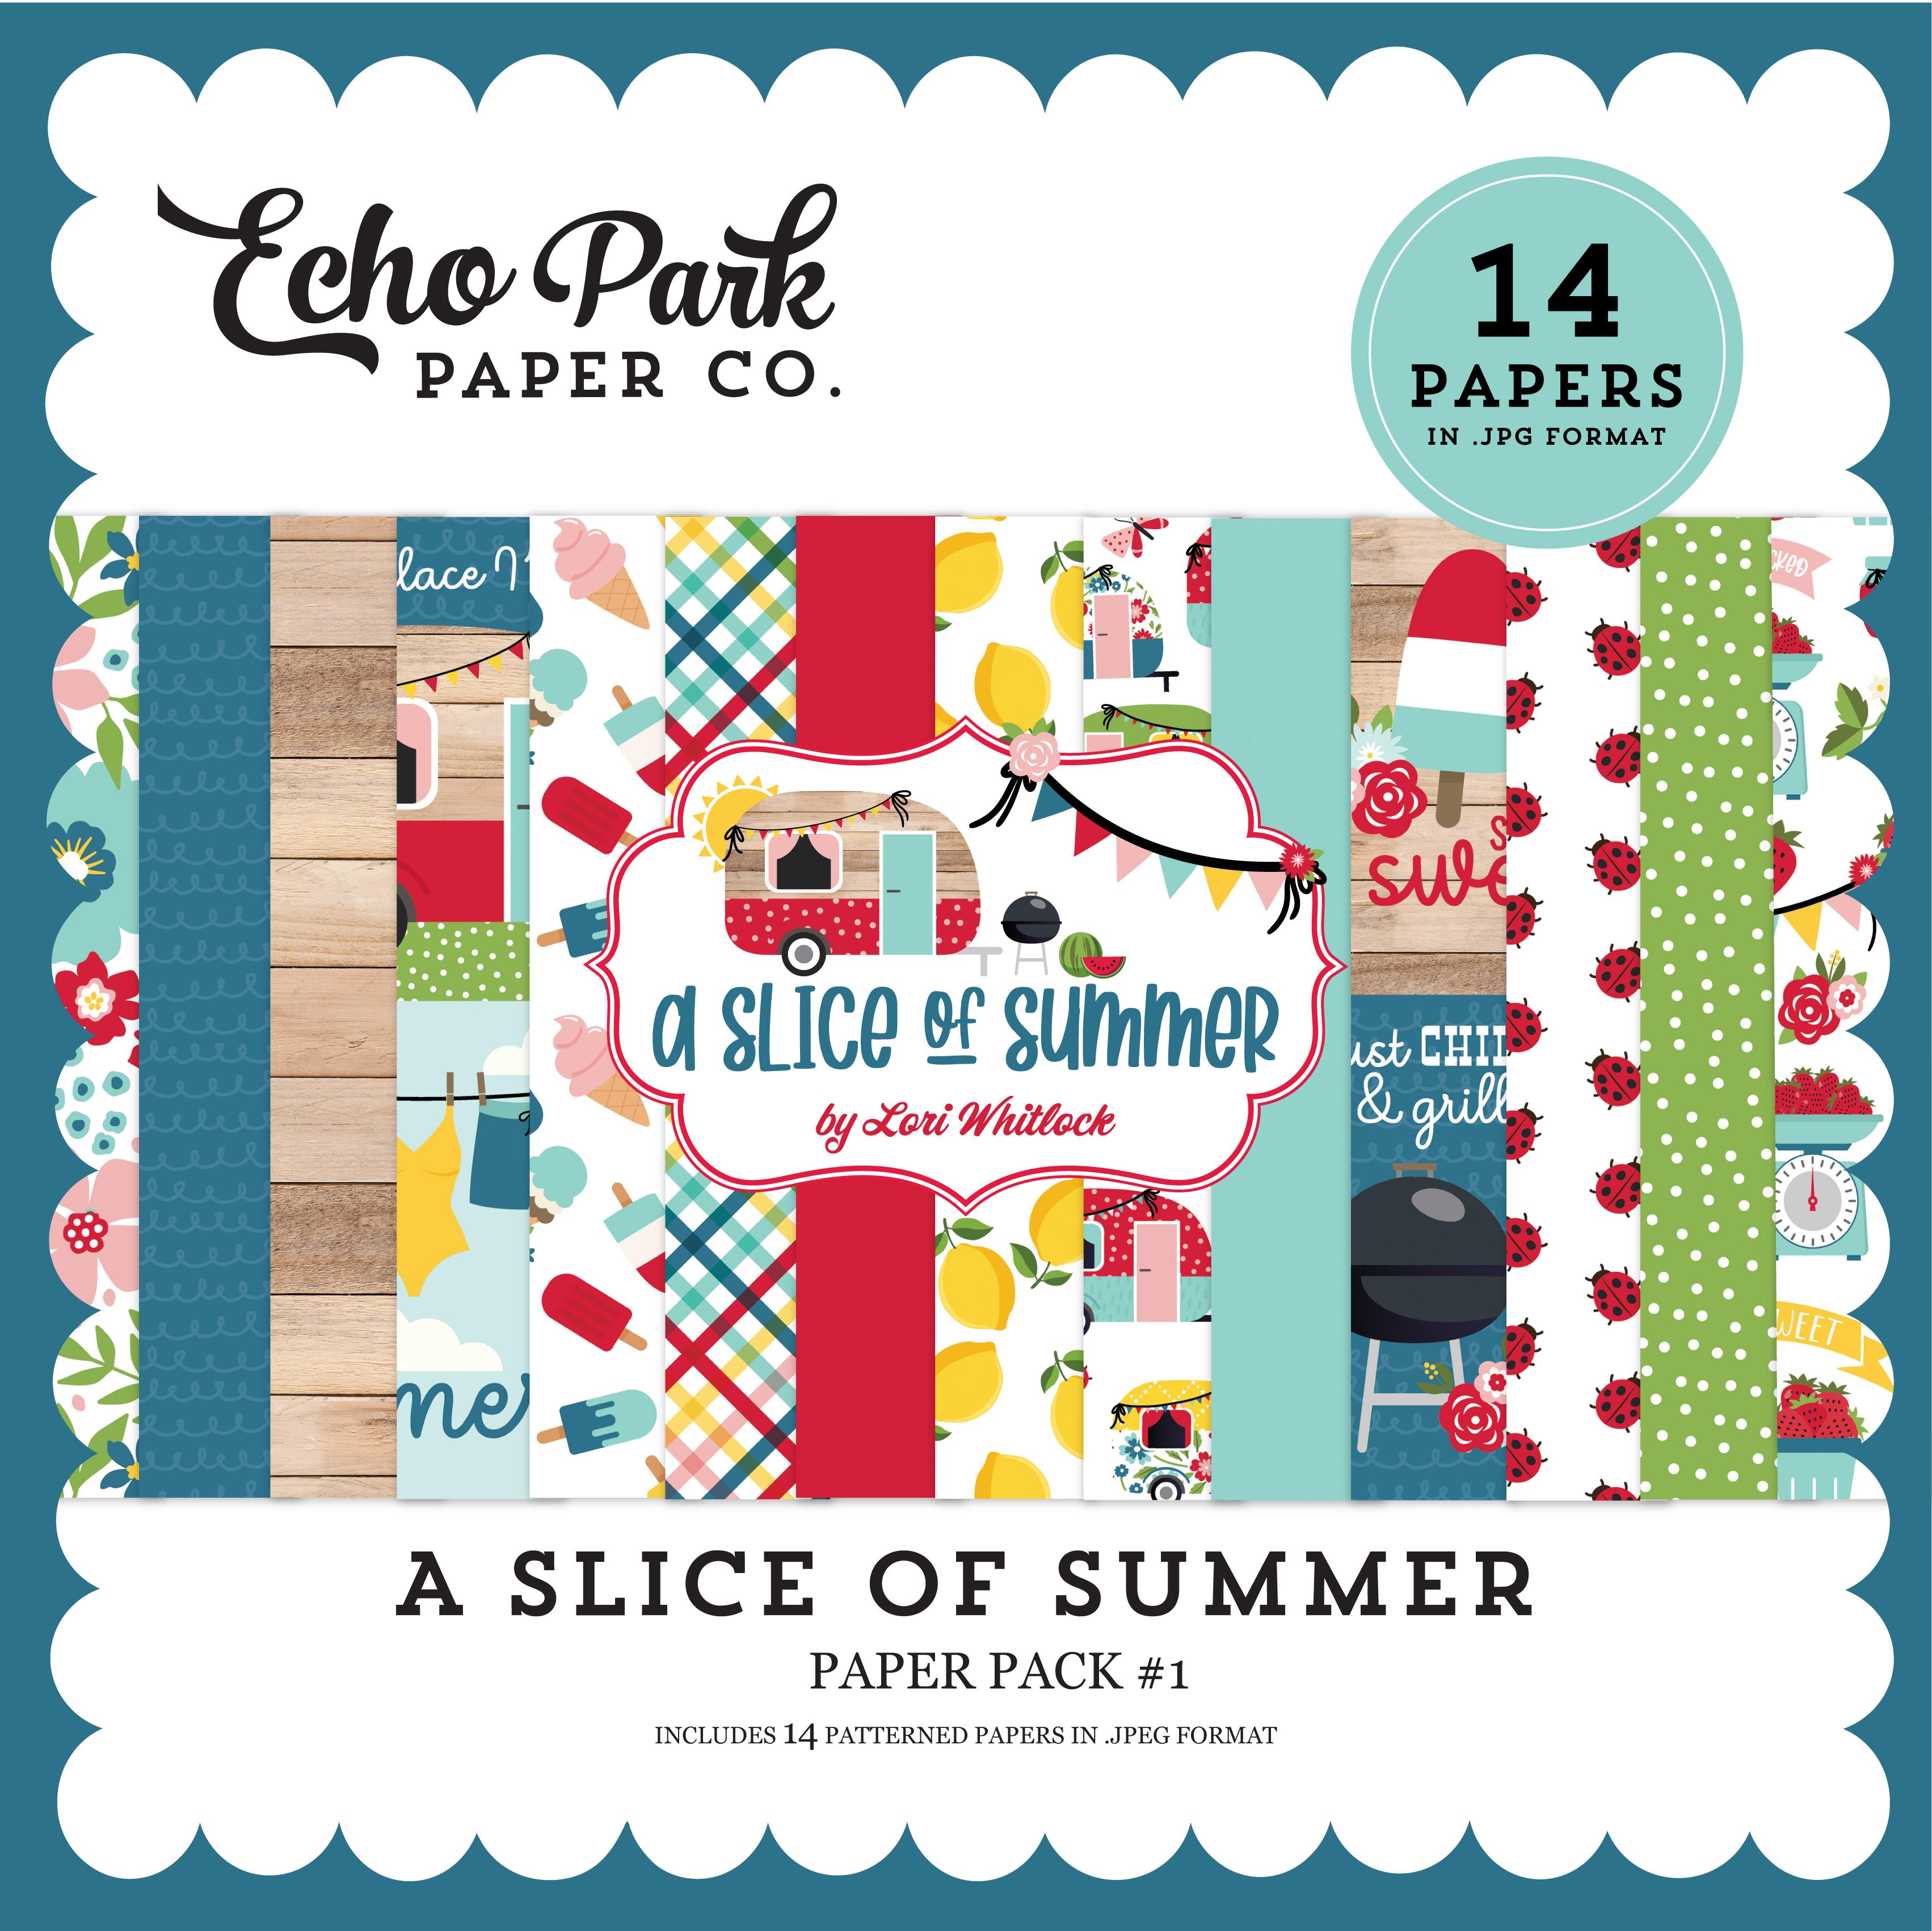 A Slice of Summer Paper Pack #1